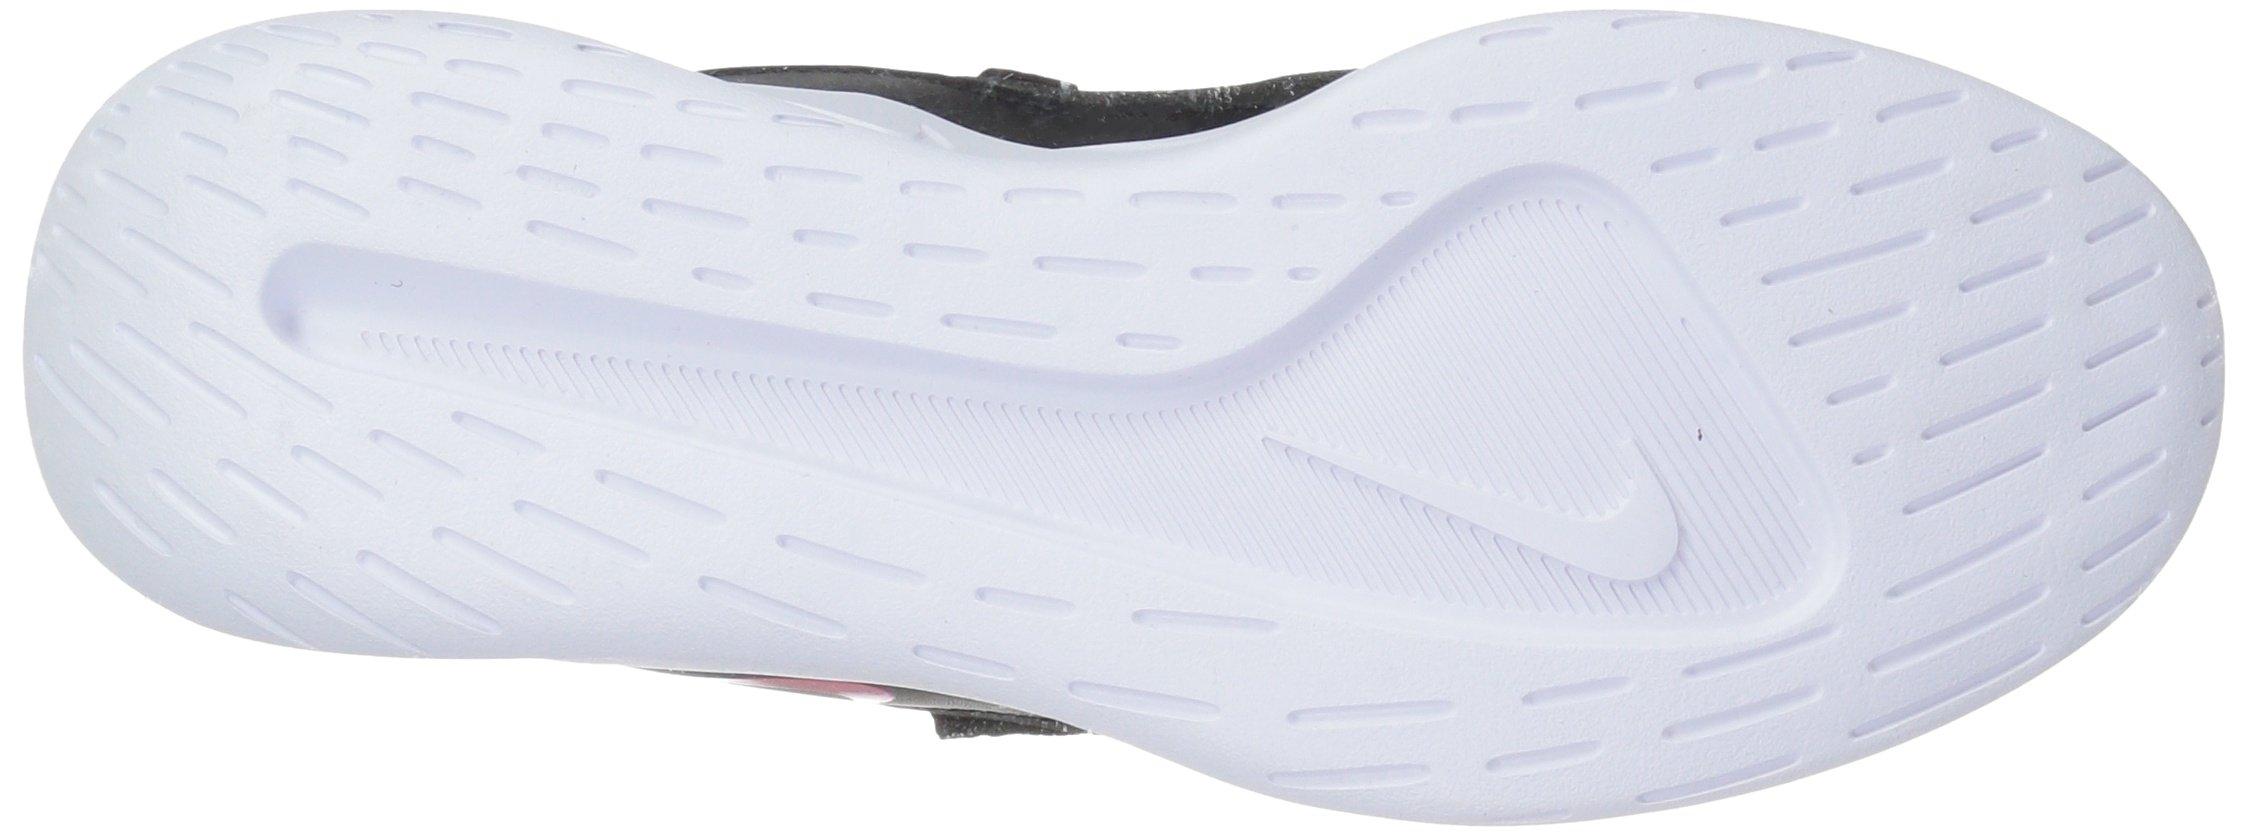 Nike Girls' Viale (GS) Running Shoe, Black/Rush Pink-White, 5Y Youth US Big Kid by Nike (Image #3)